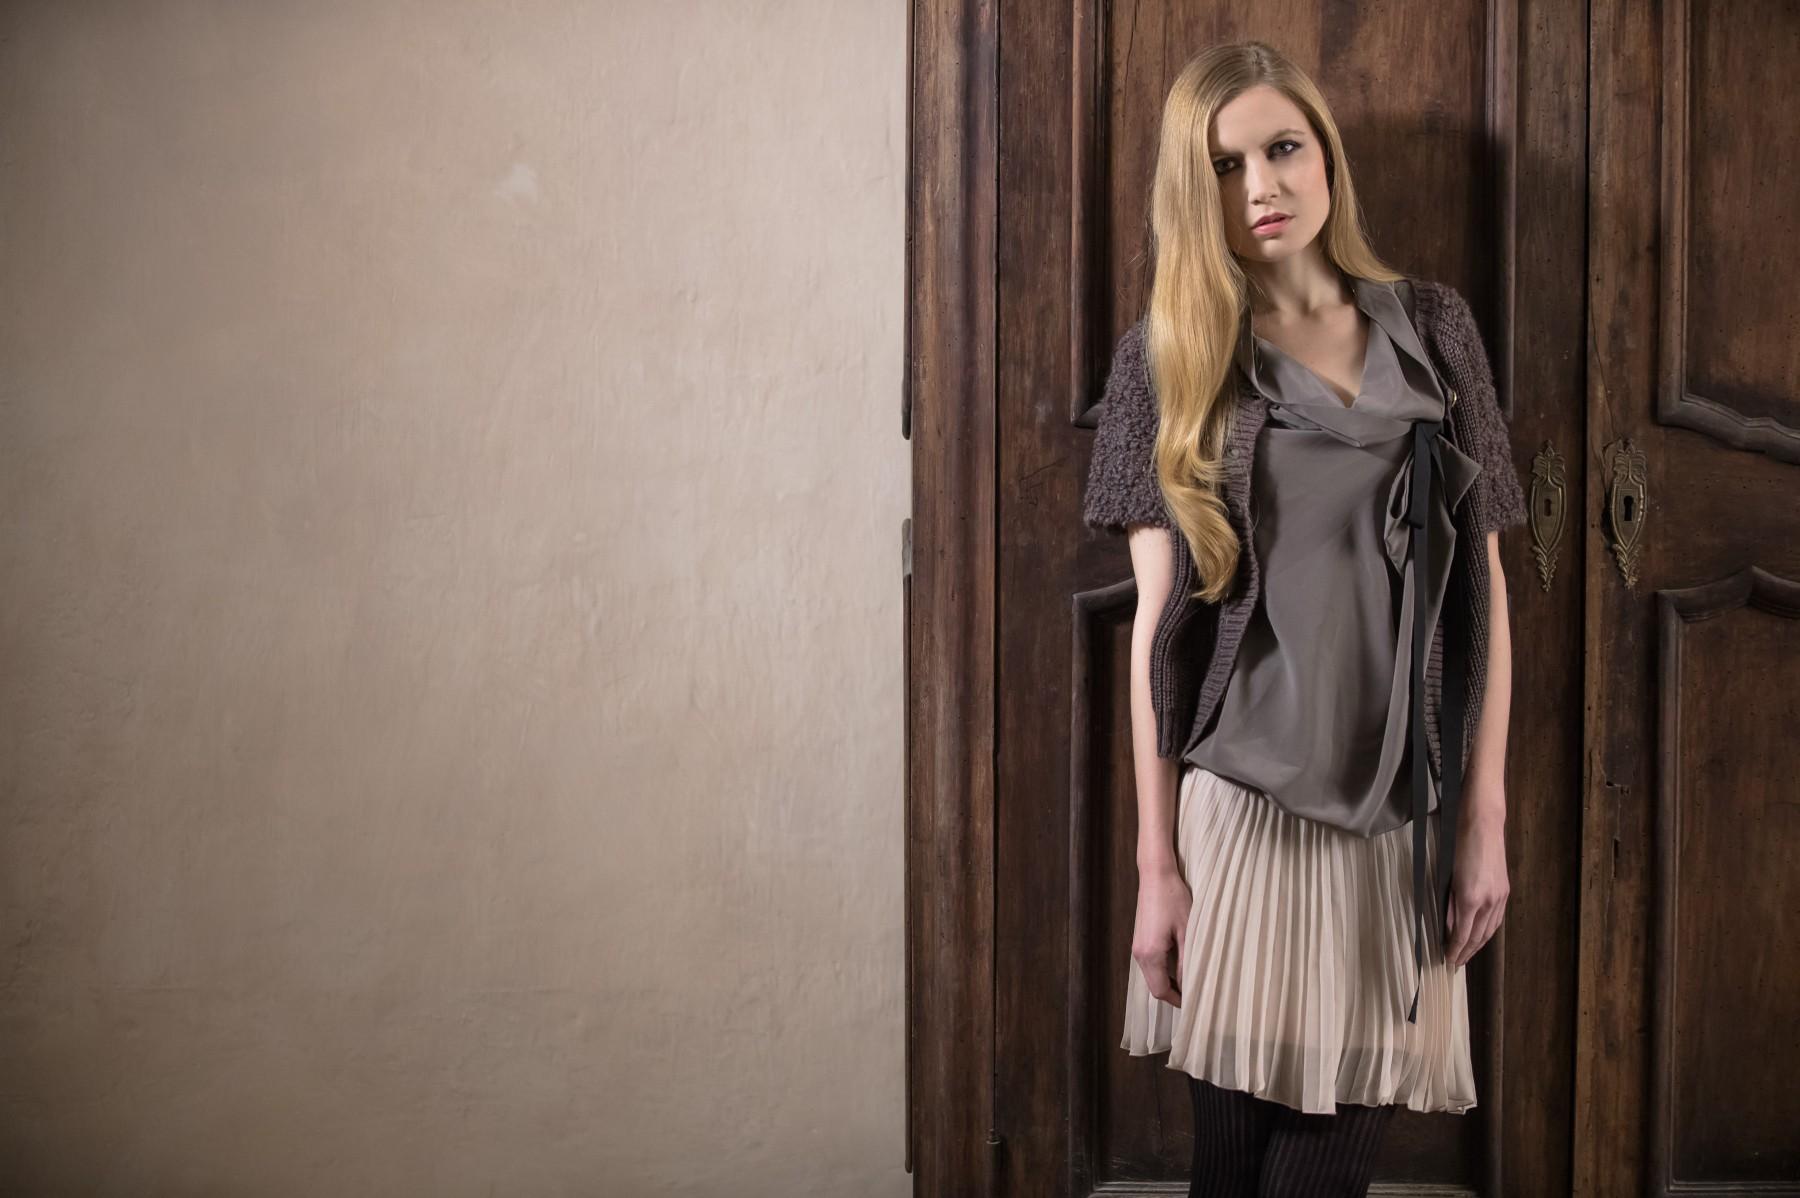 123_ElleEmme_2013- Fashion/Adv